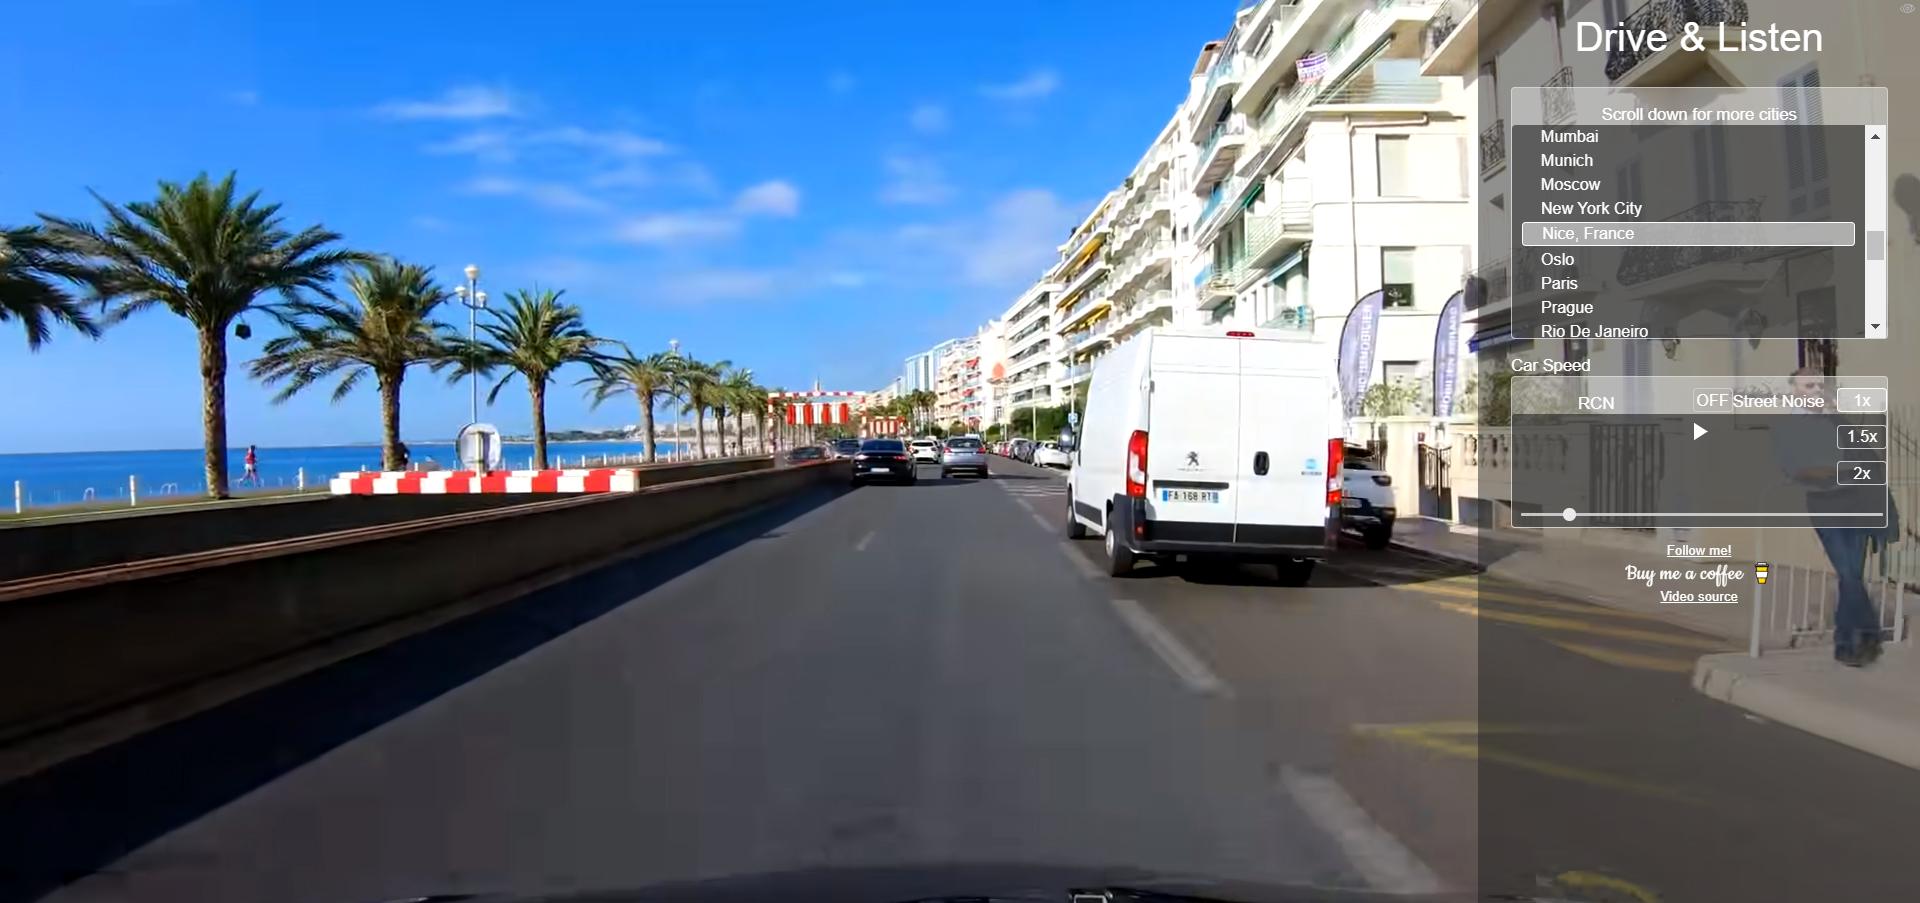 Schöne Idee: Dashcam-Videos plus lokales Radio